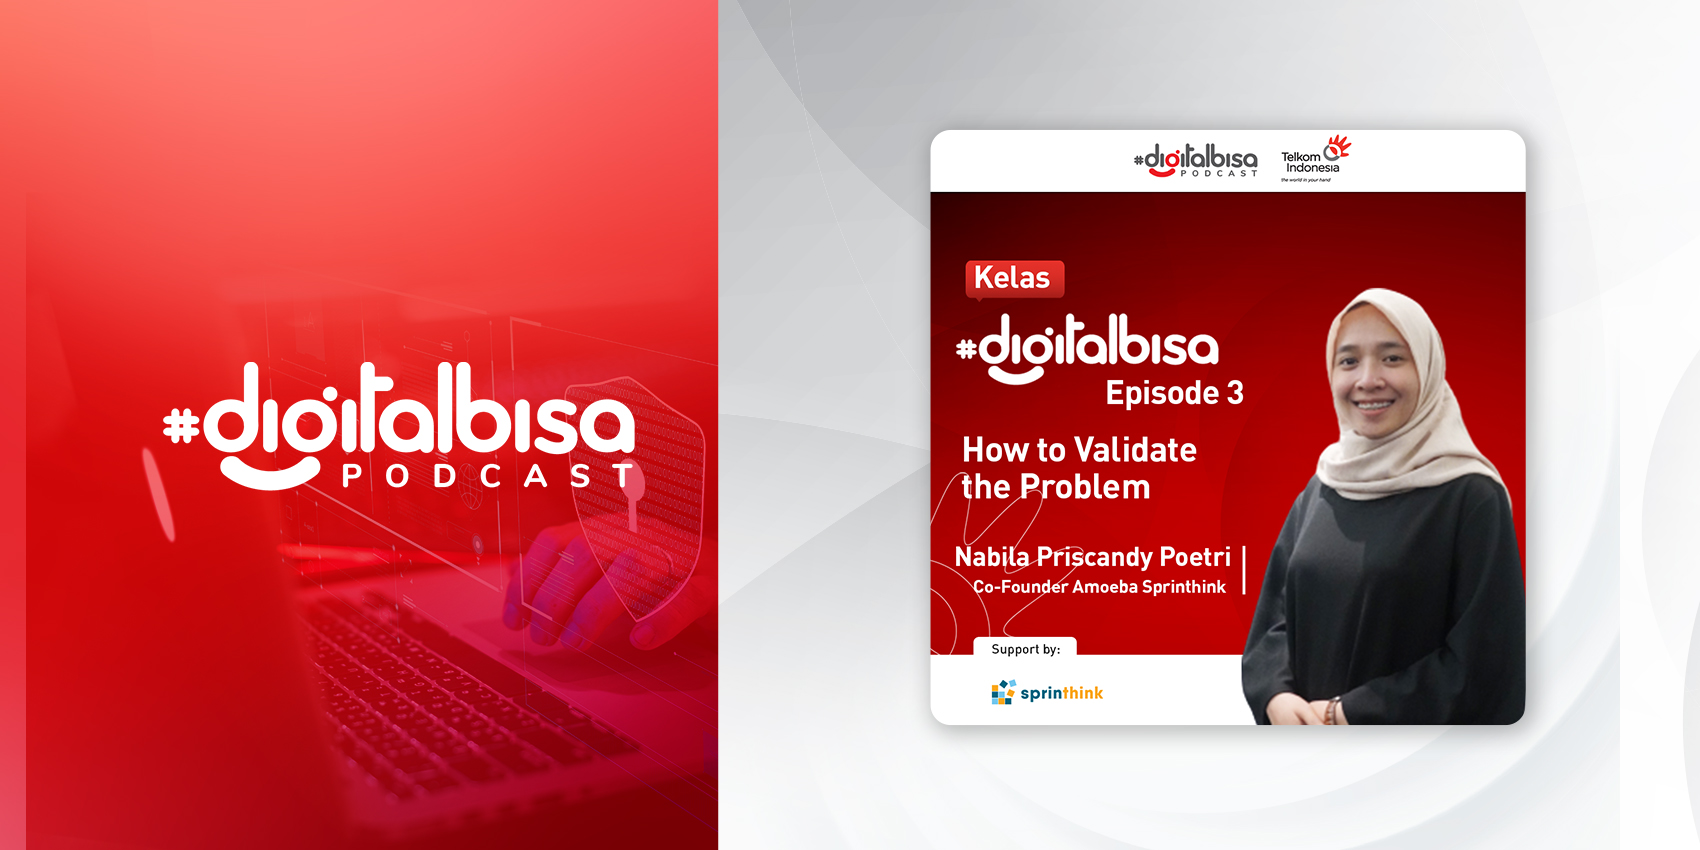 How to Validate the Problem - Nabila Poetri (Co-founder Amoeba Sprinthink)   Kelas #DigitalBisa